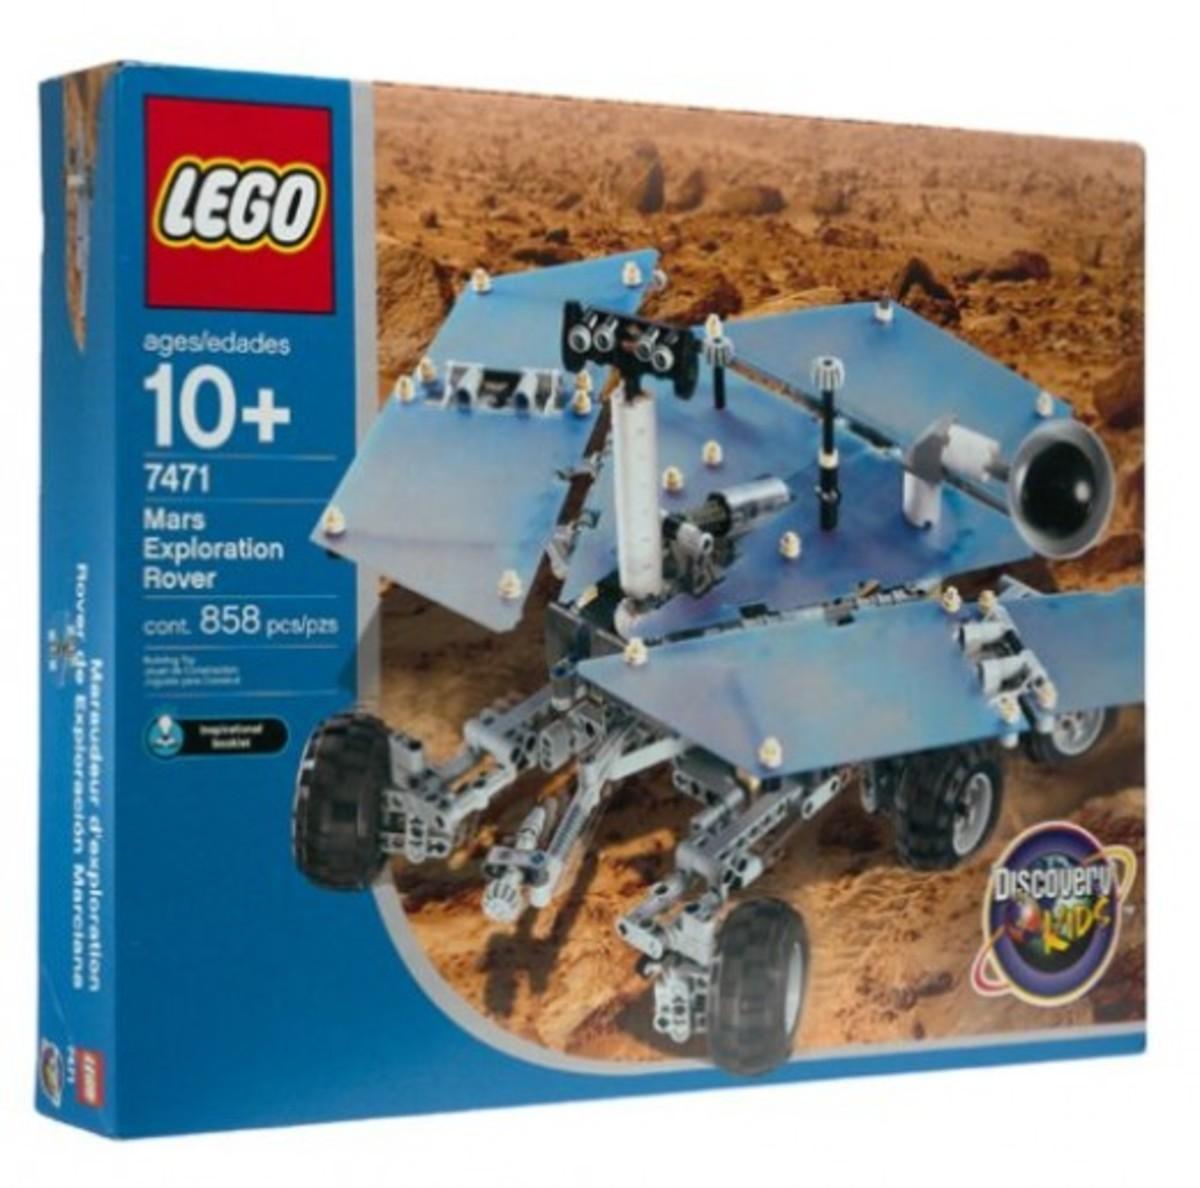 LEGO Discovery Mars Exploration Rover 7471 Box